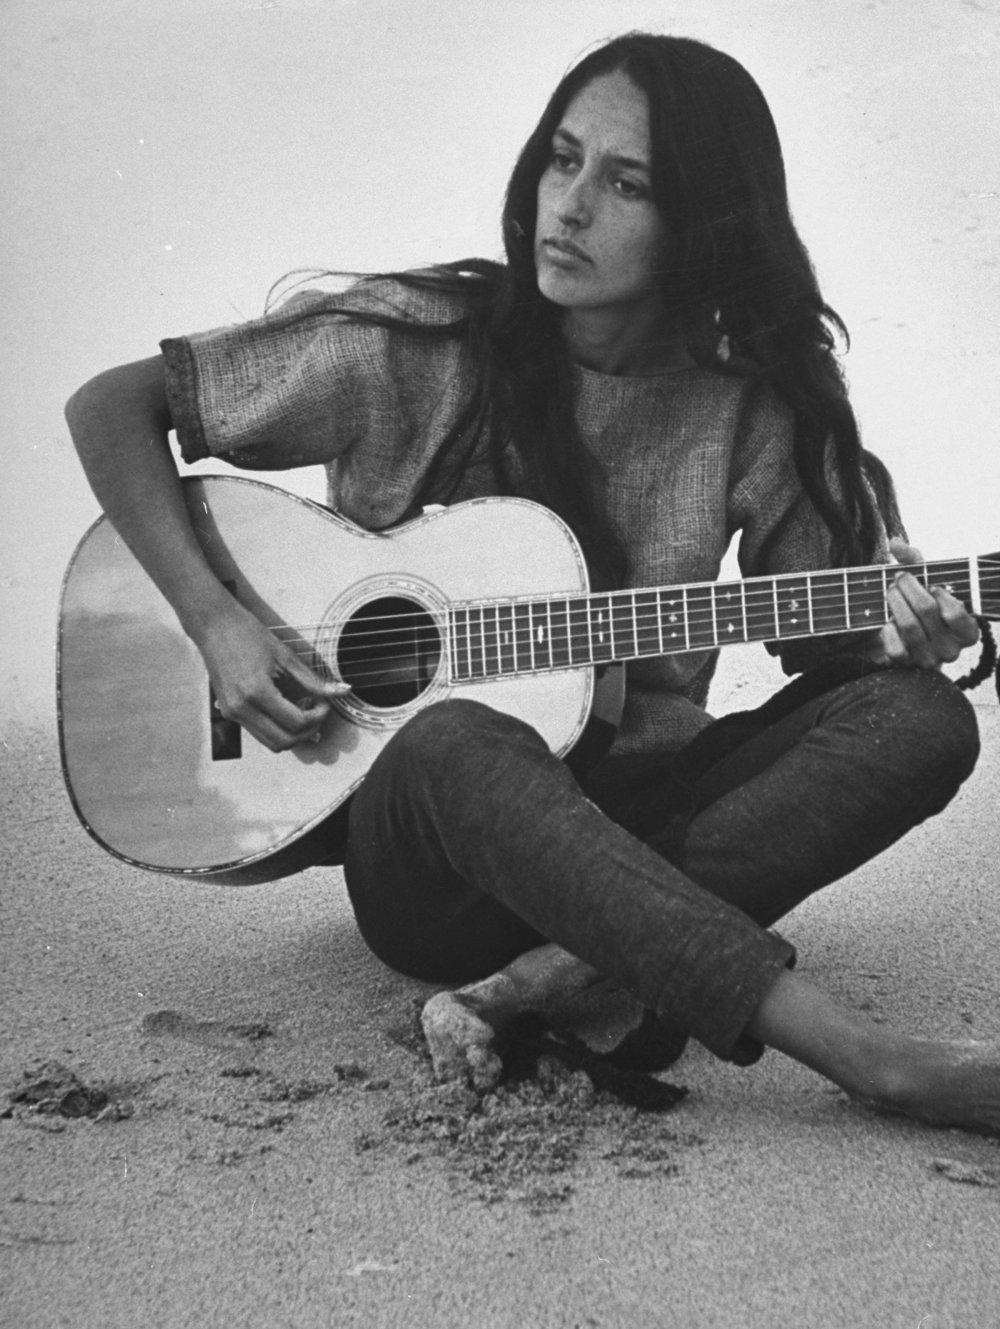 Joan Baez - Award winning folk singer, songwriter, musician, and activist